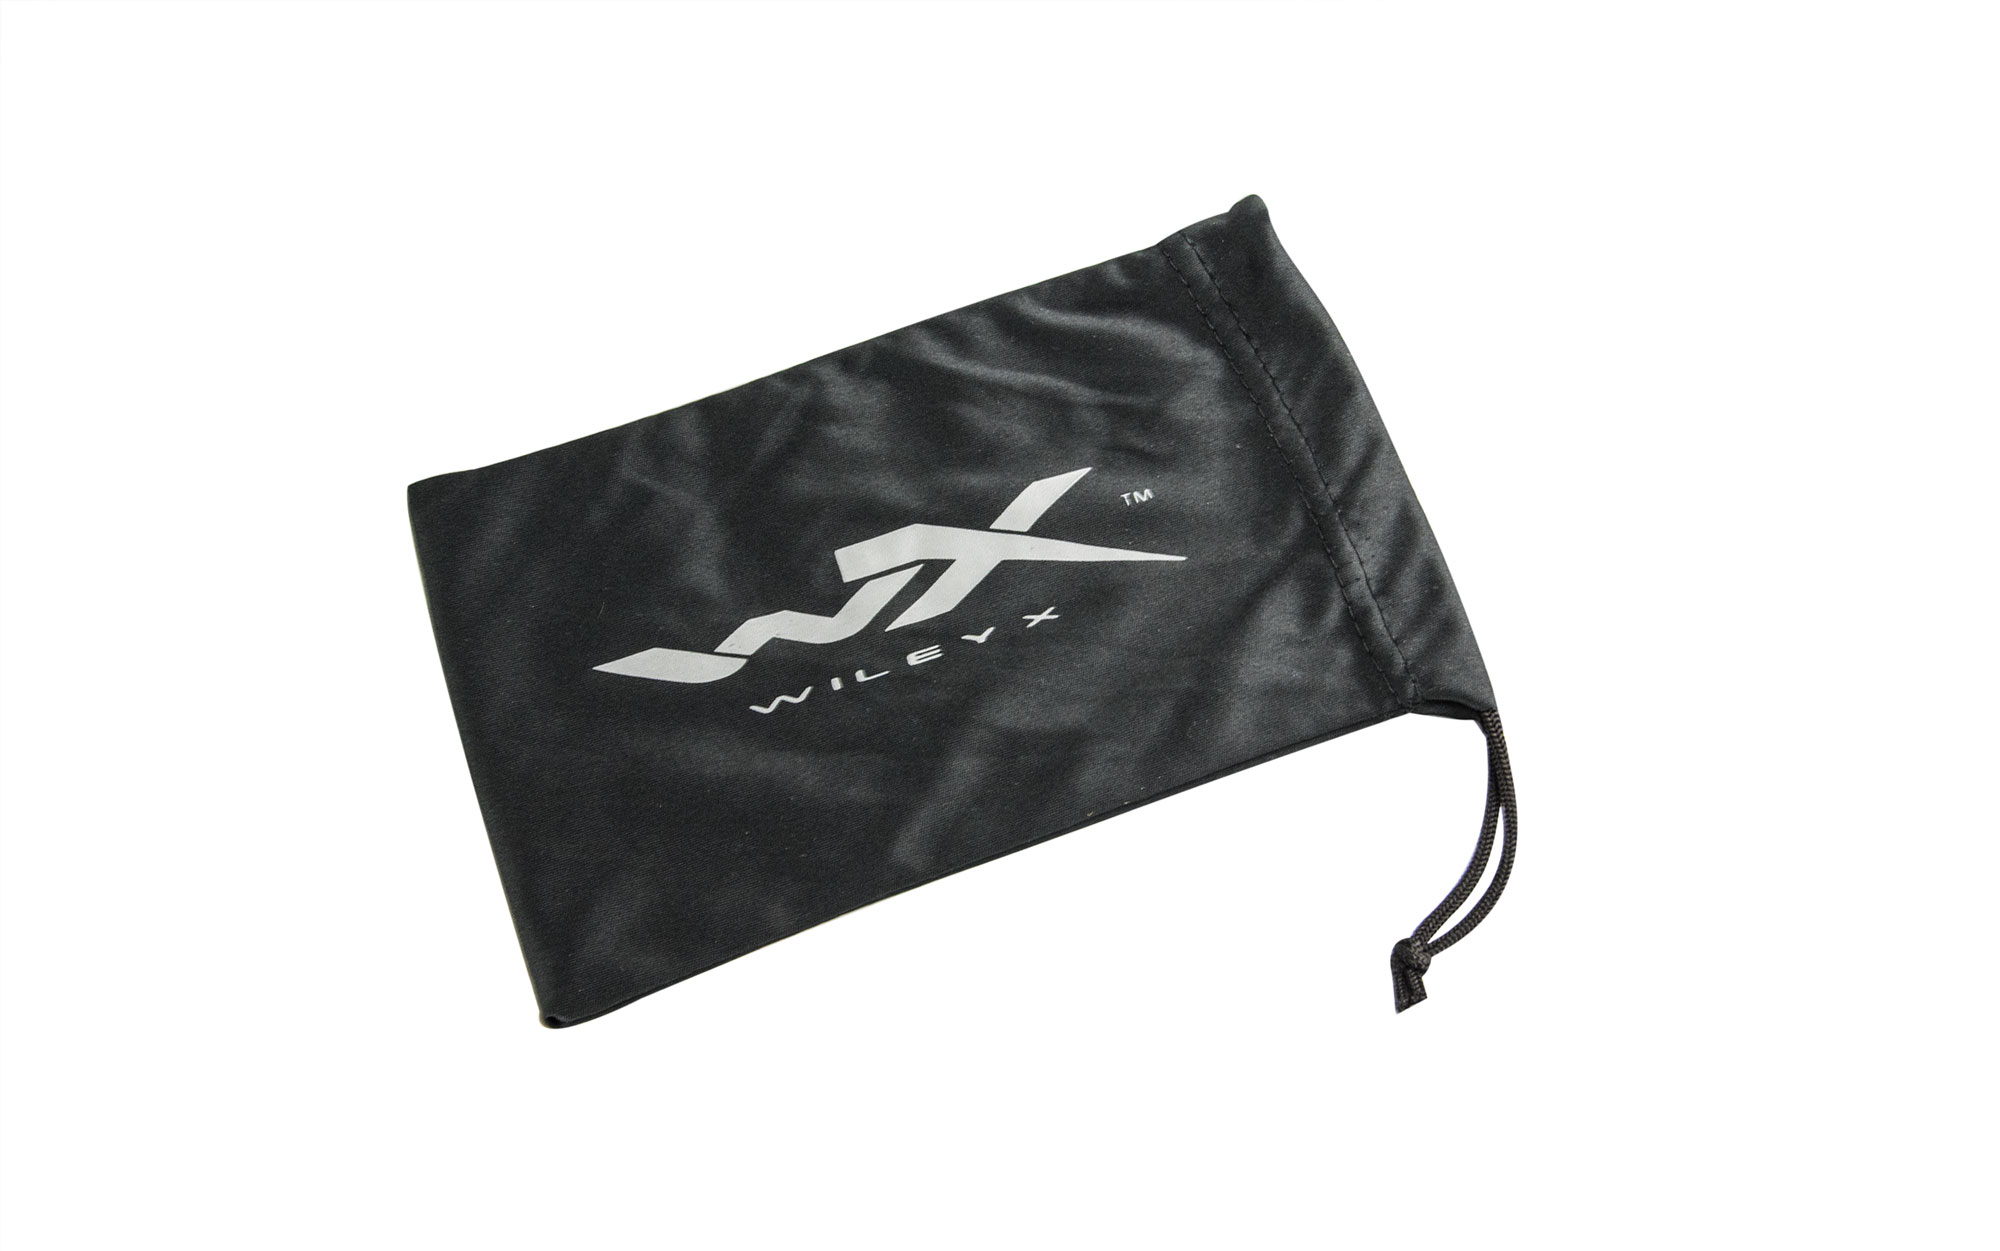 Microfiber Drawstring Bag Image